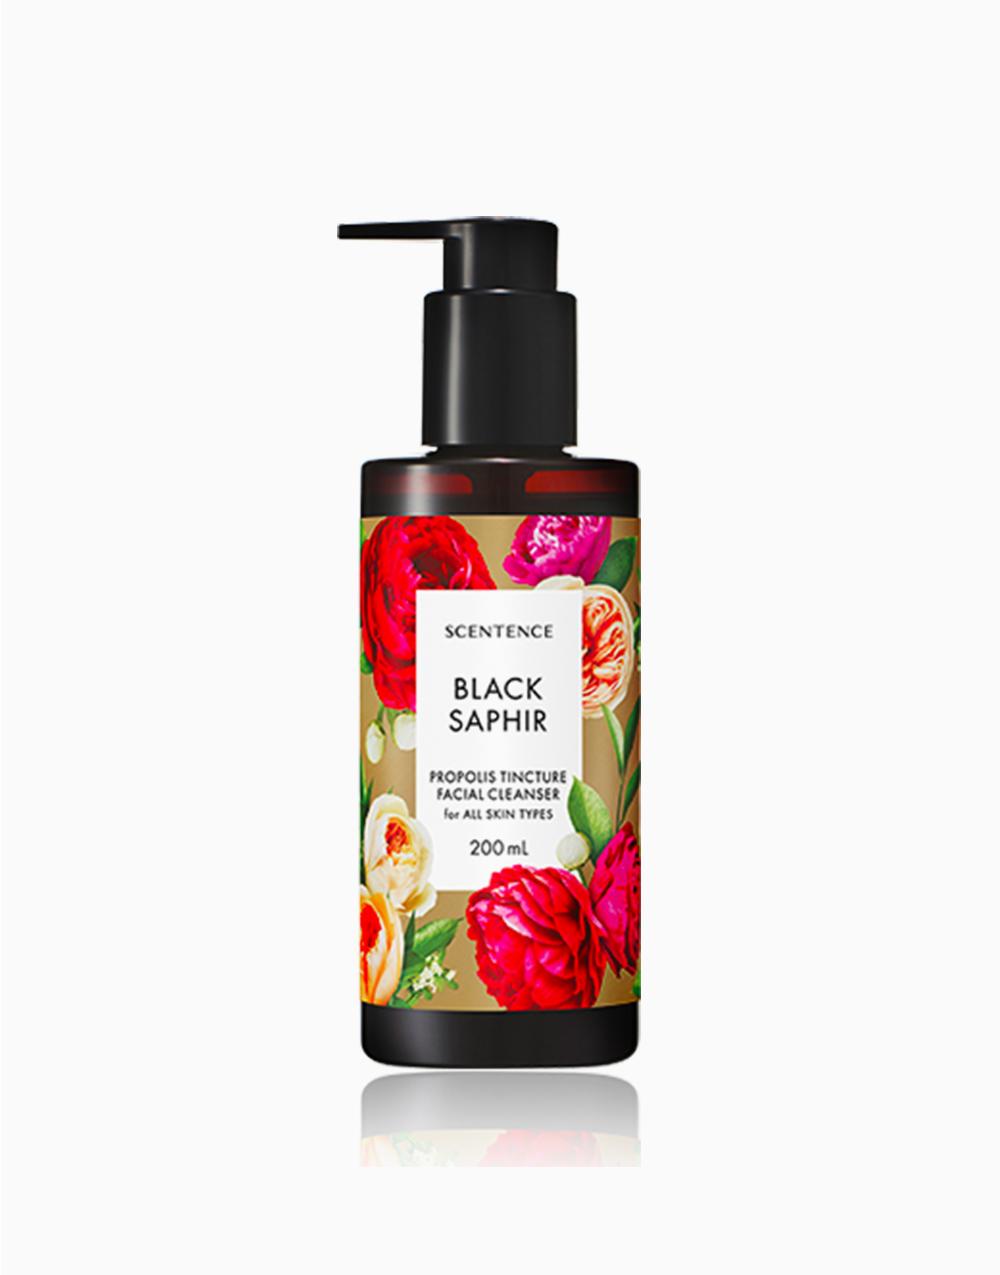 Black Saphir Propolis Tincture Facial Cleanser by Scentence